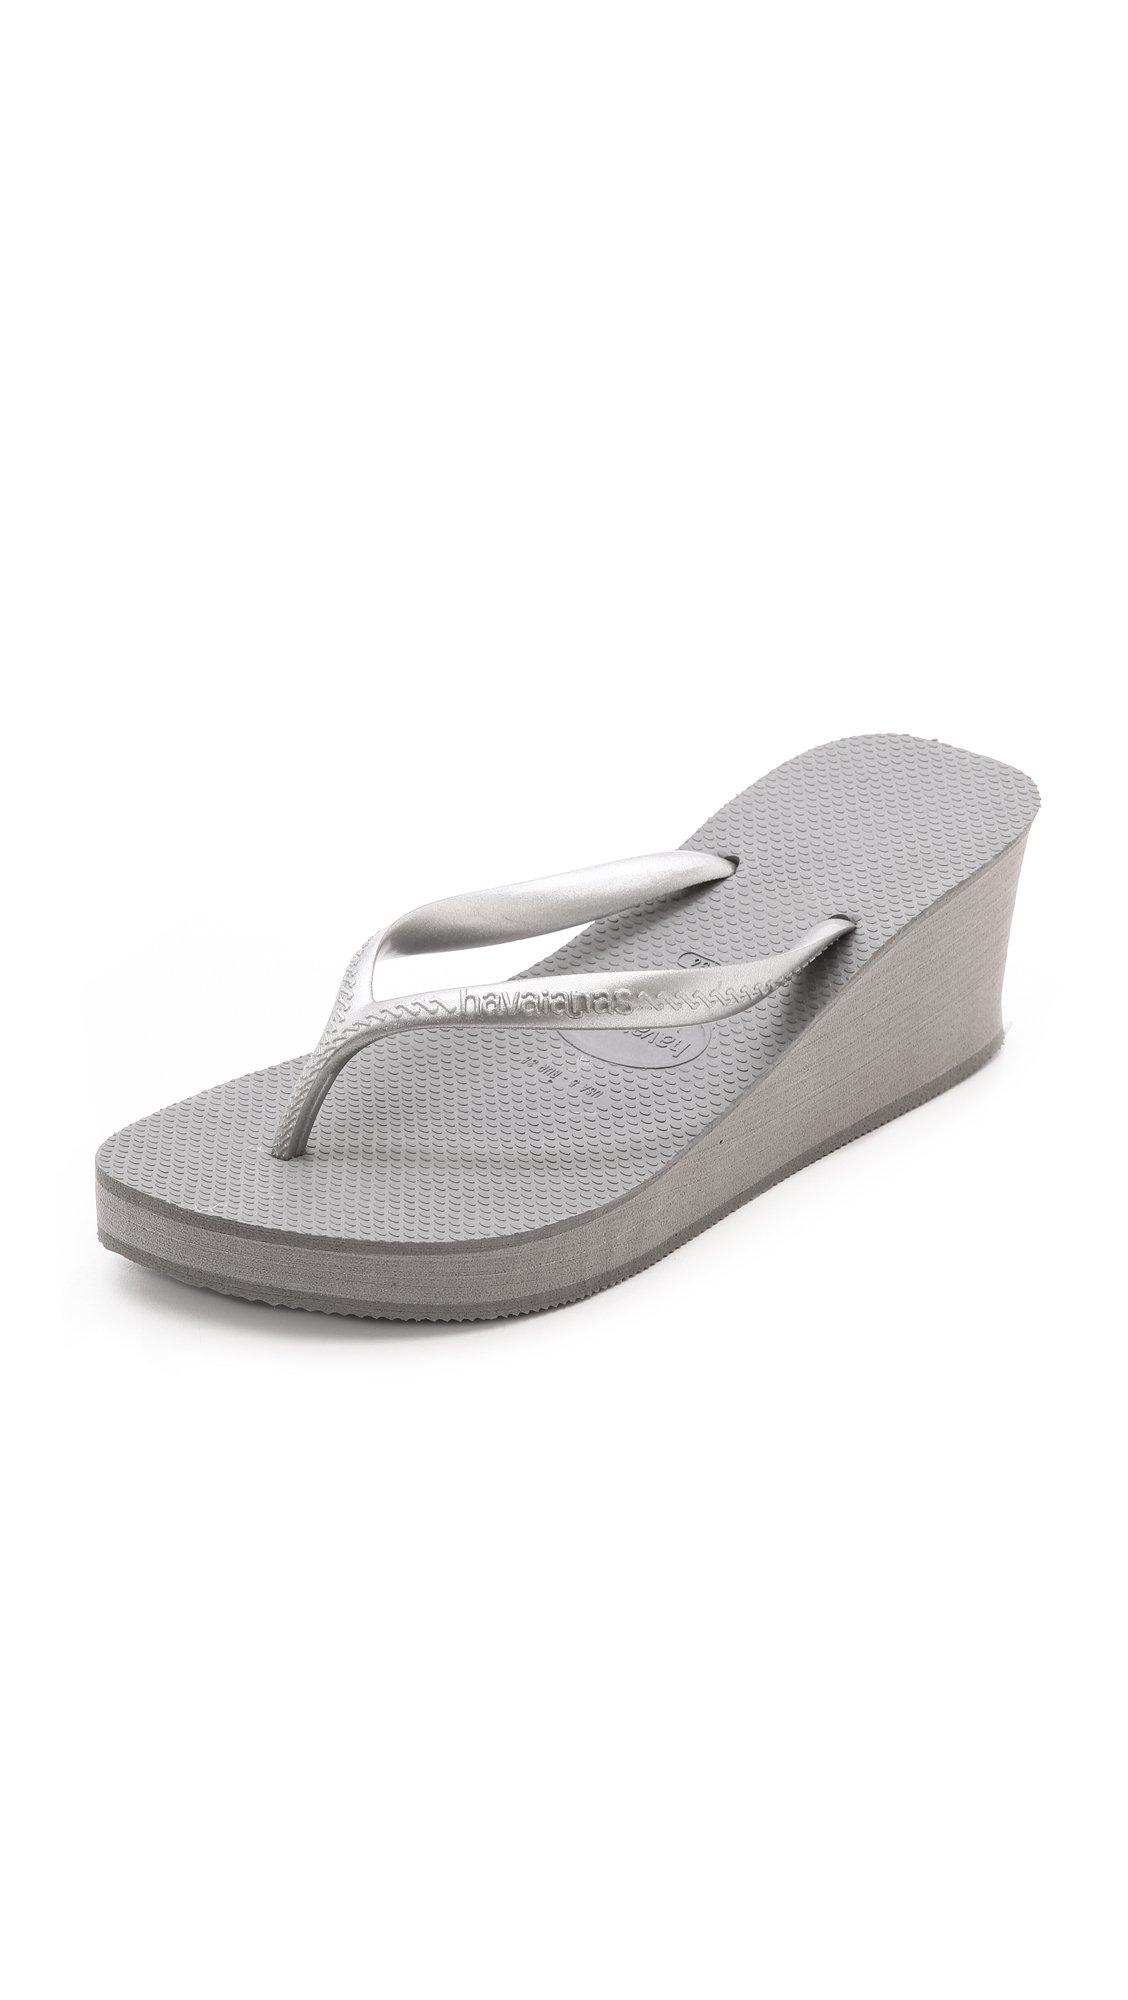 Havaianas High Fashion Wedge Flip Flops In Grey Gray - Lyst-6032